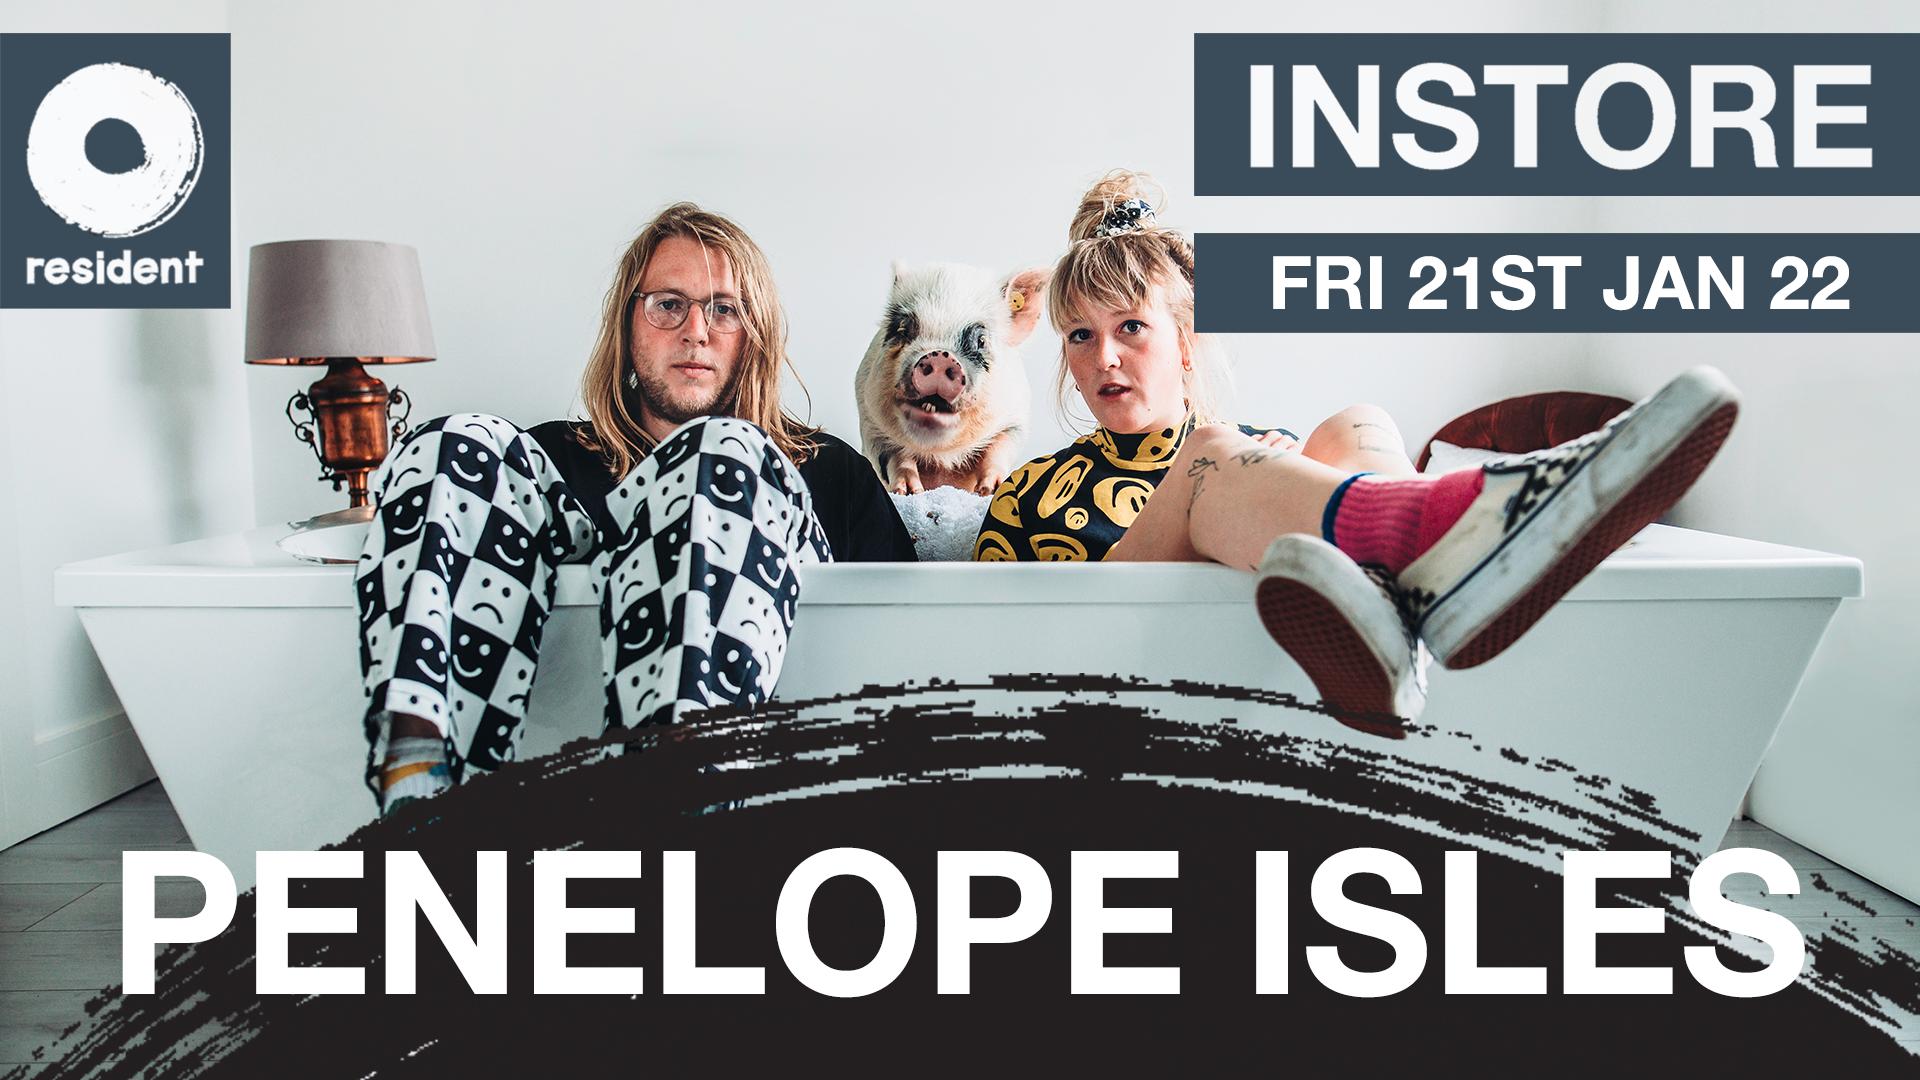 Penelope-Isles-rescheduled-SIDEBAR